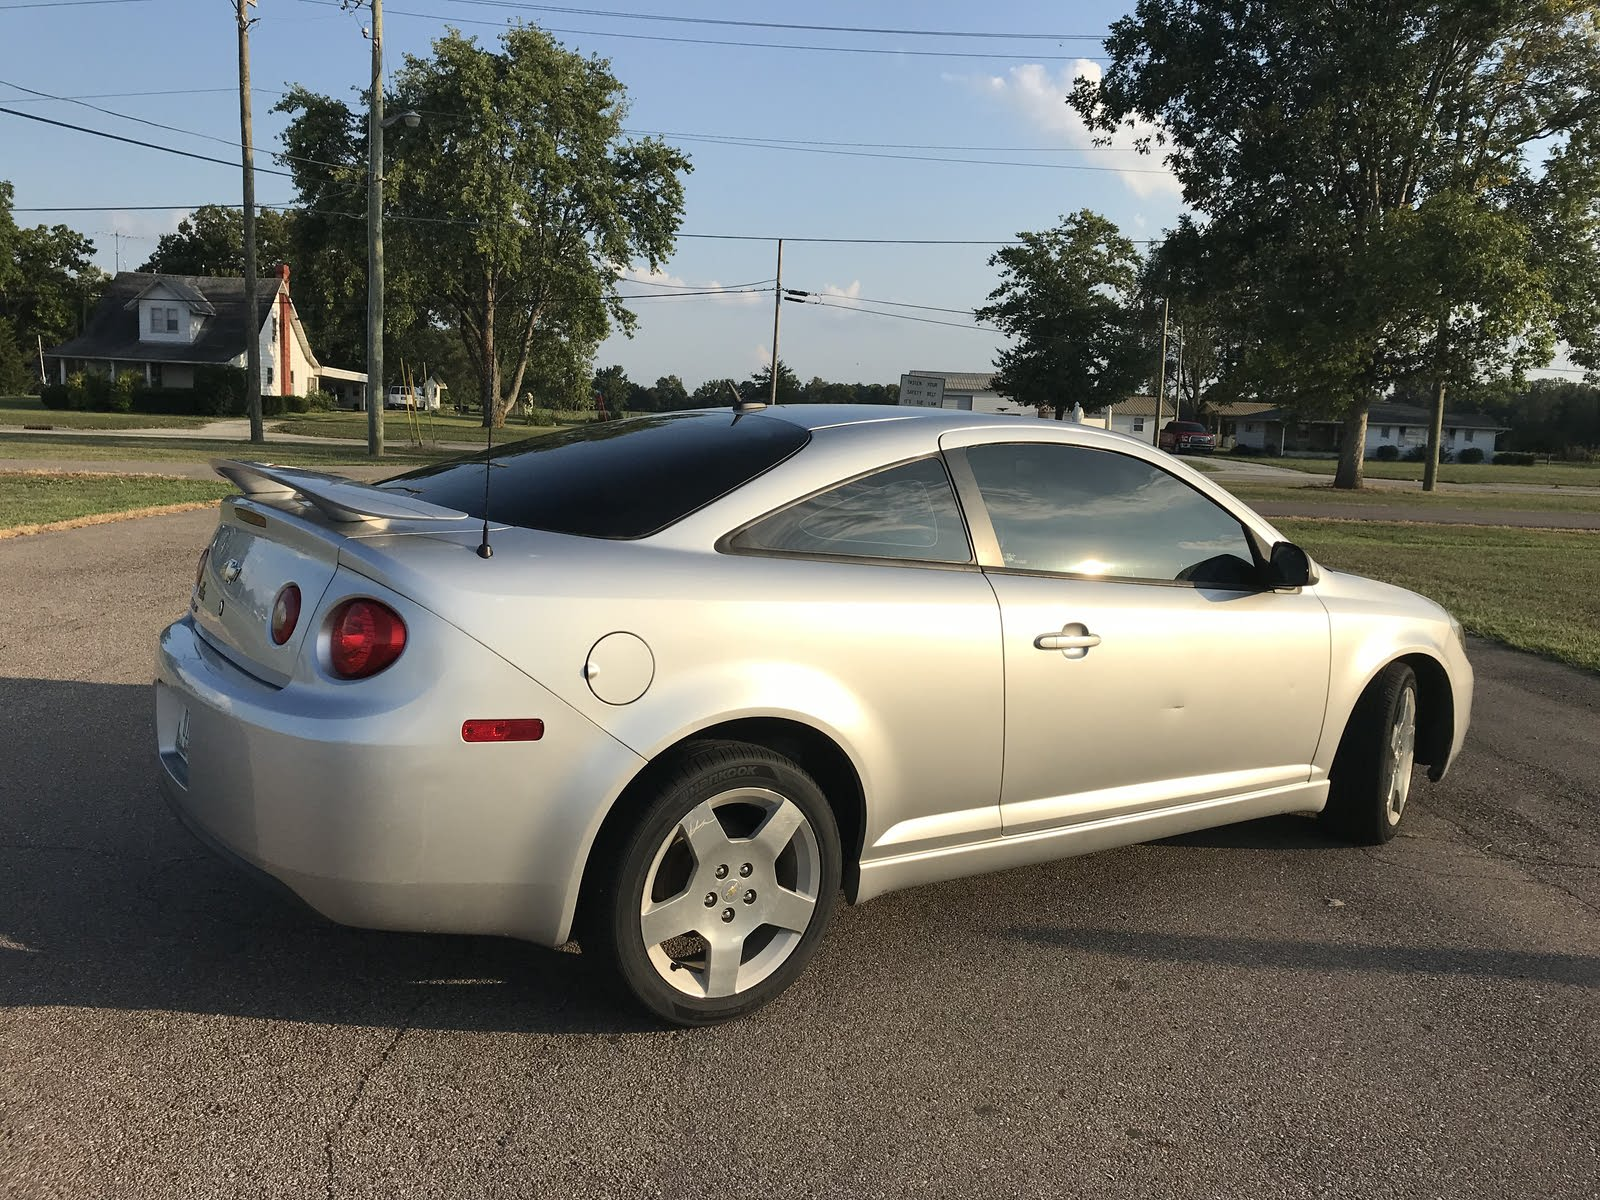 2010 Chevrolet Cobalt - Overview - CarGurus